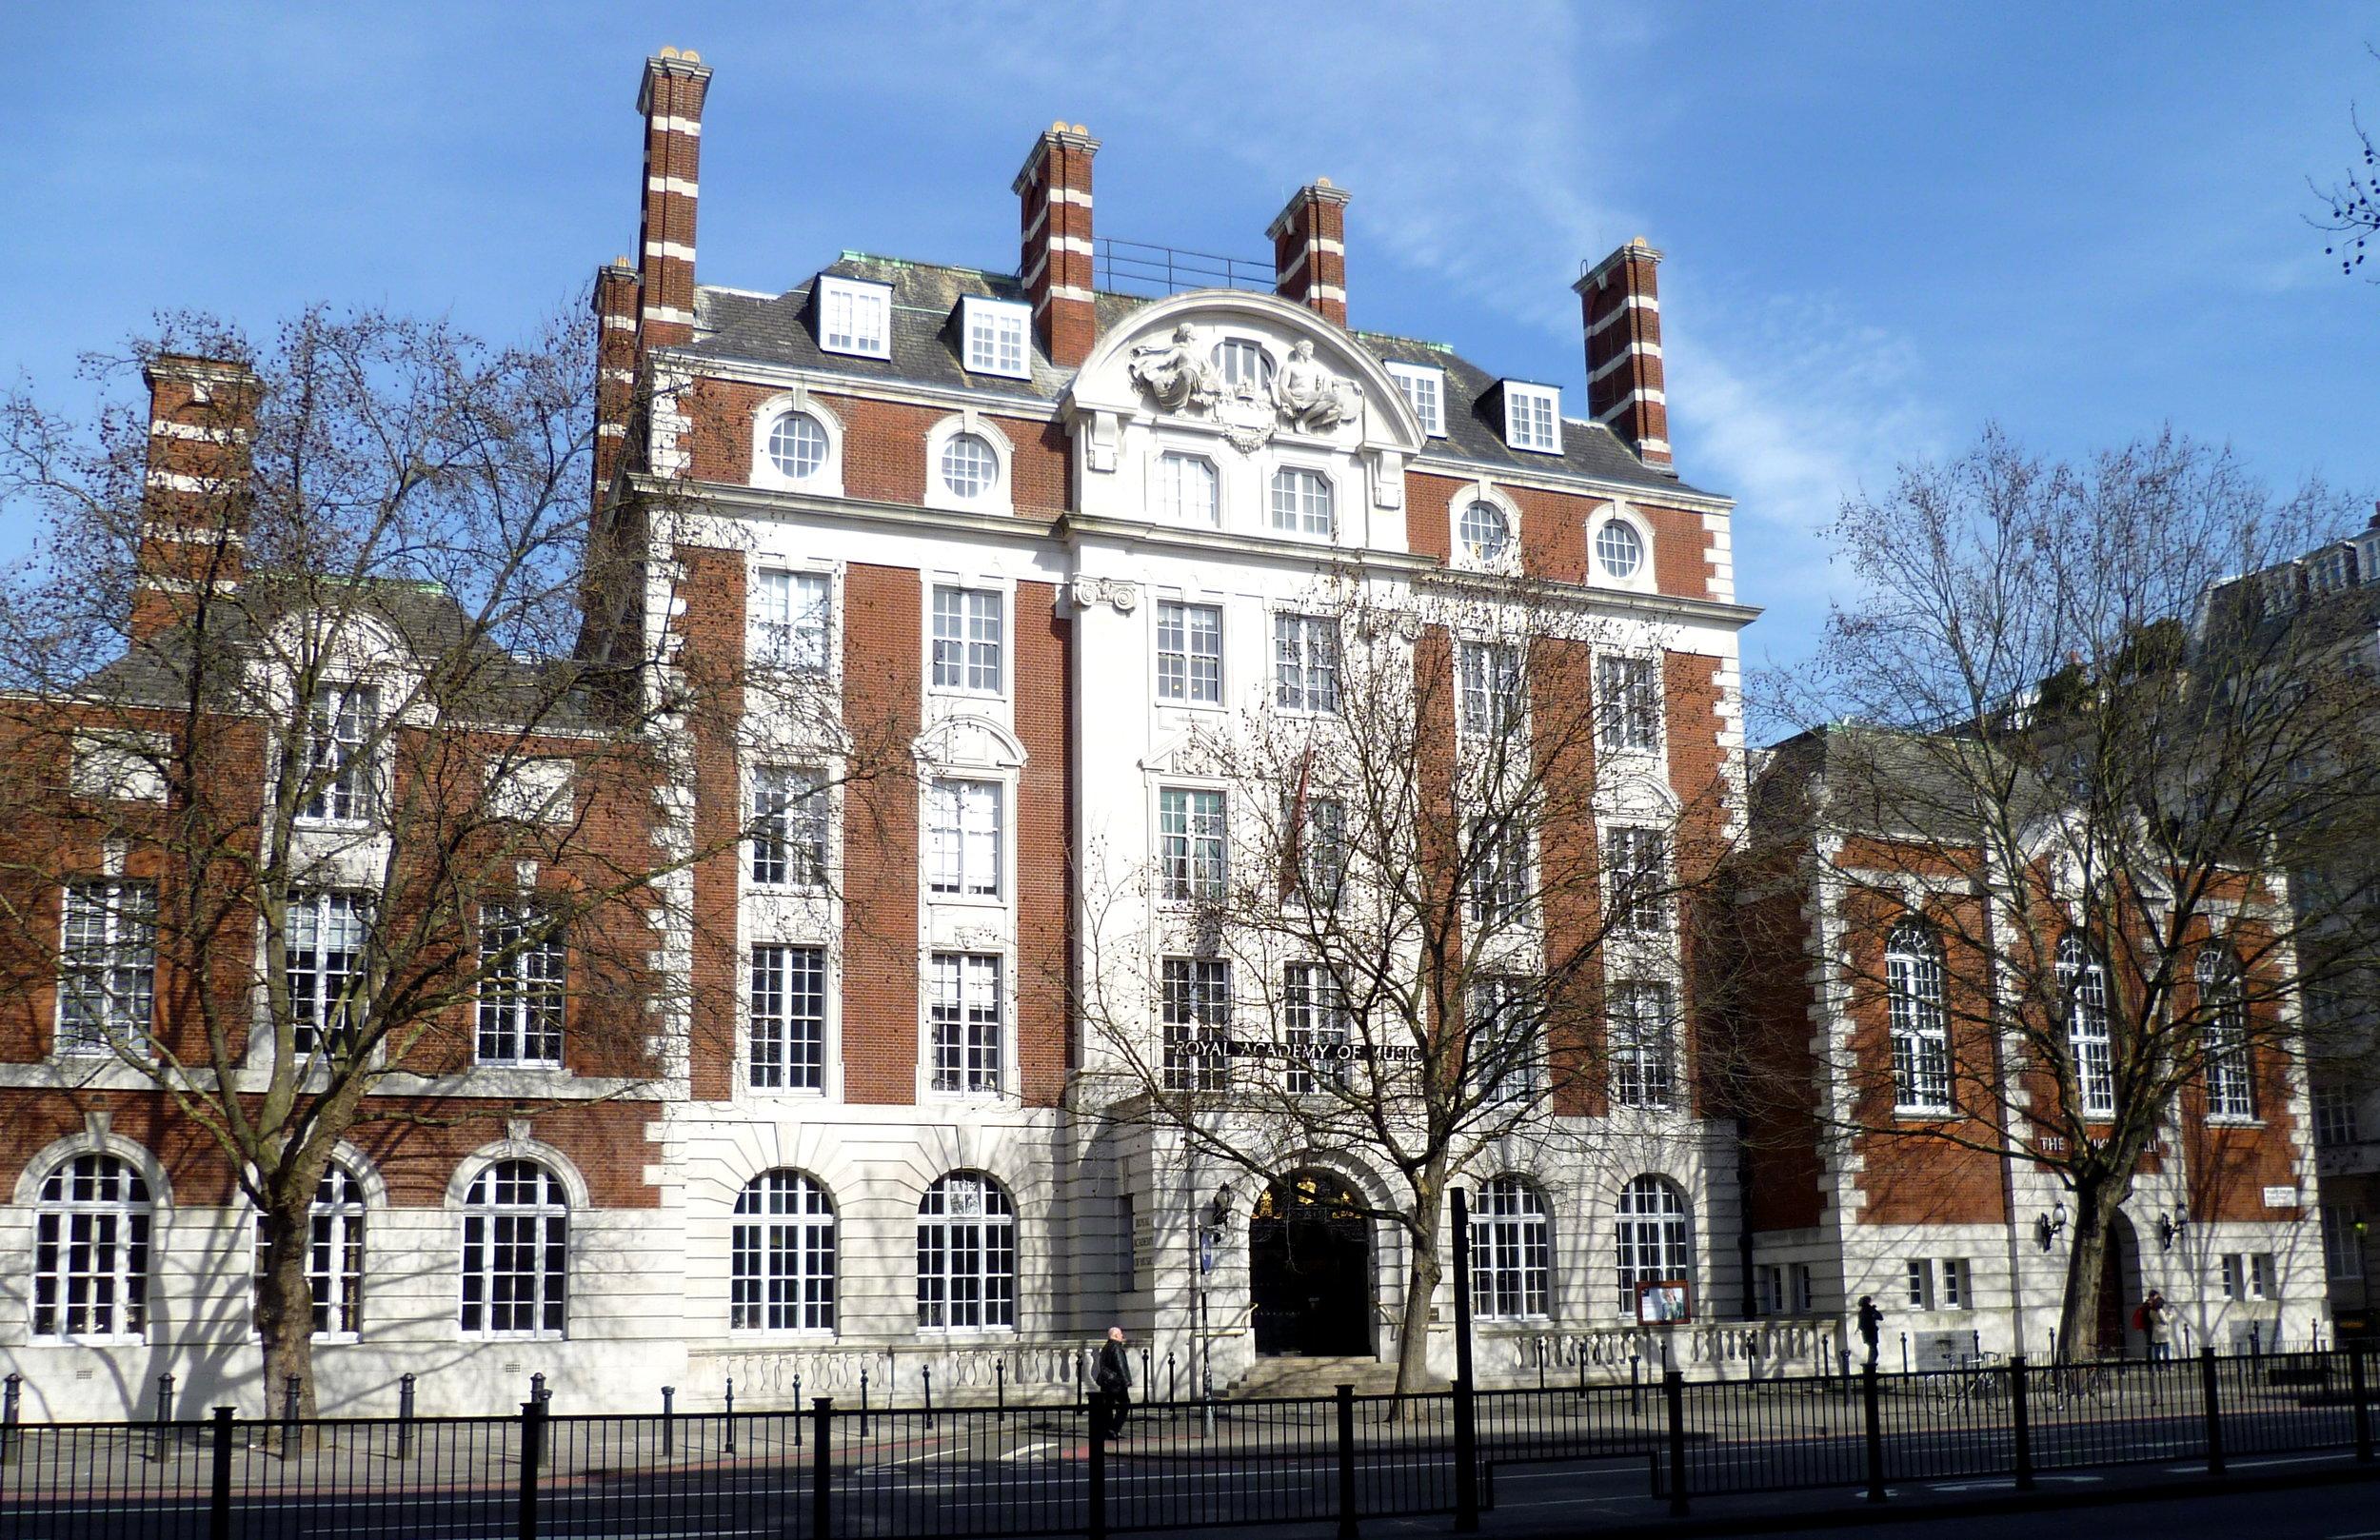 8. Royal Academy of Music